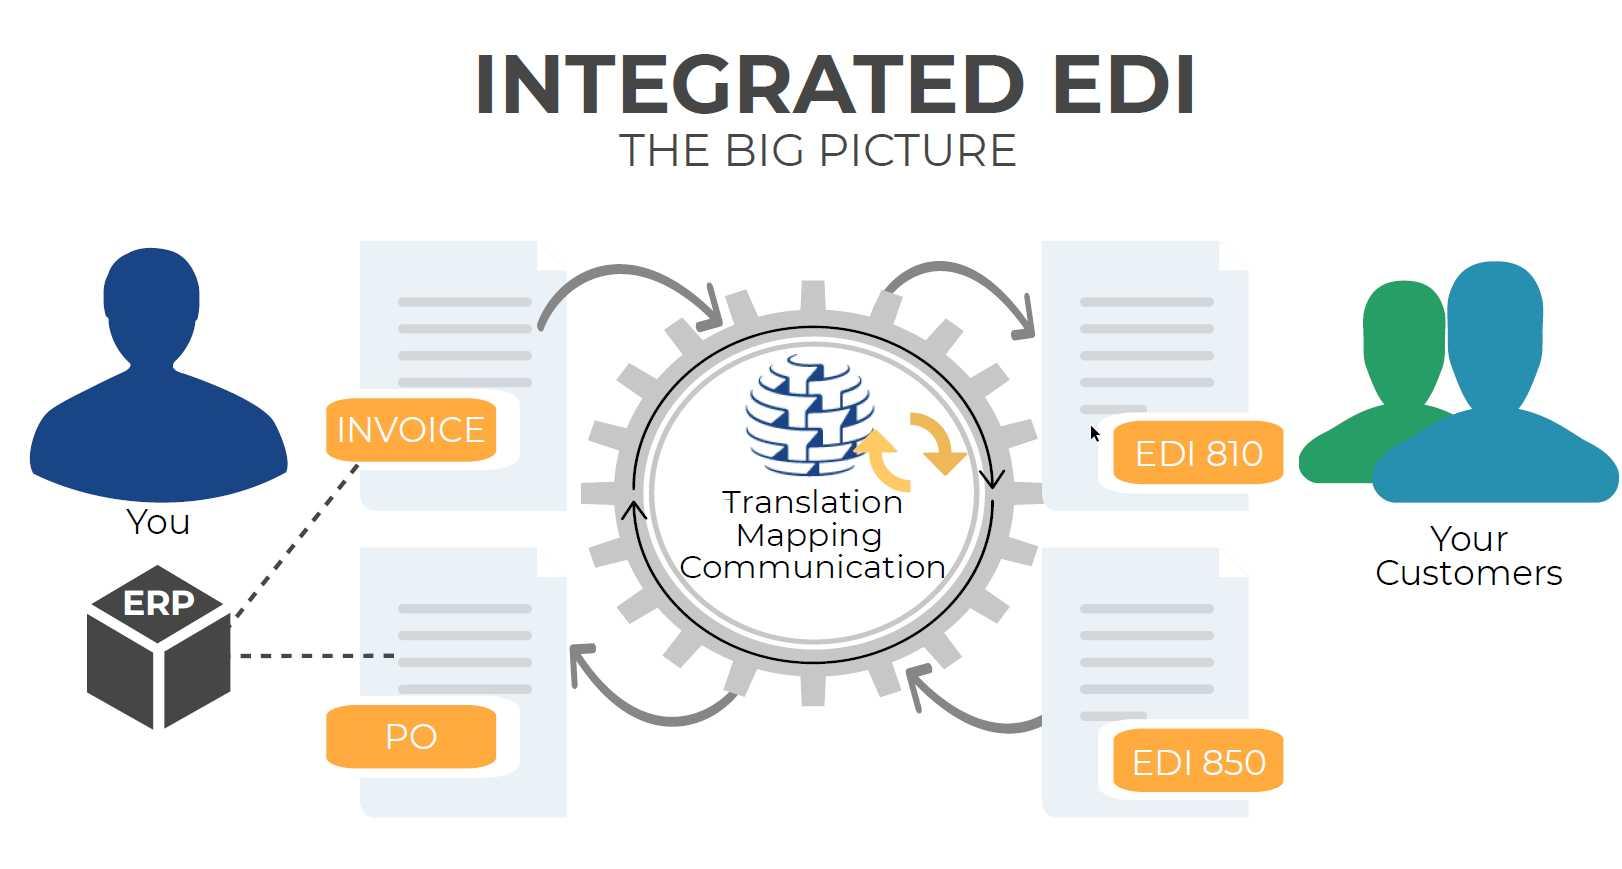 Commport Communications Integrated EDI Process